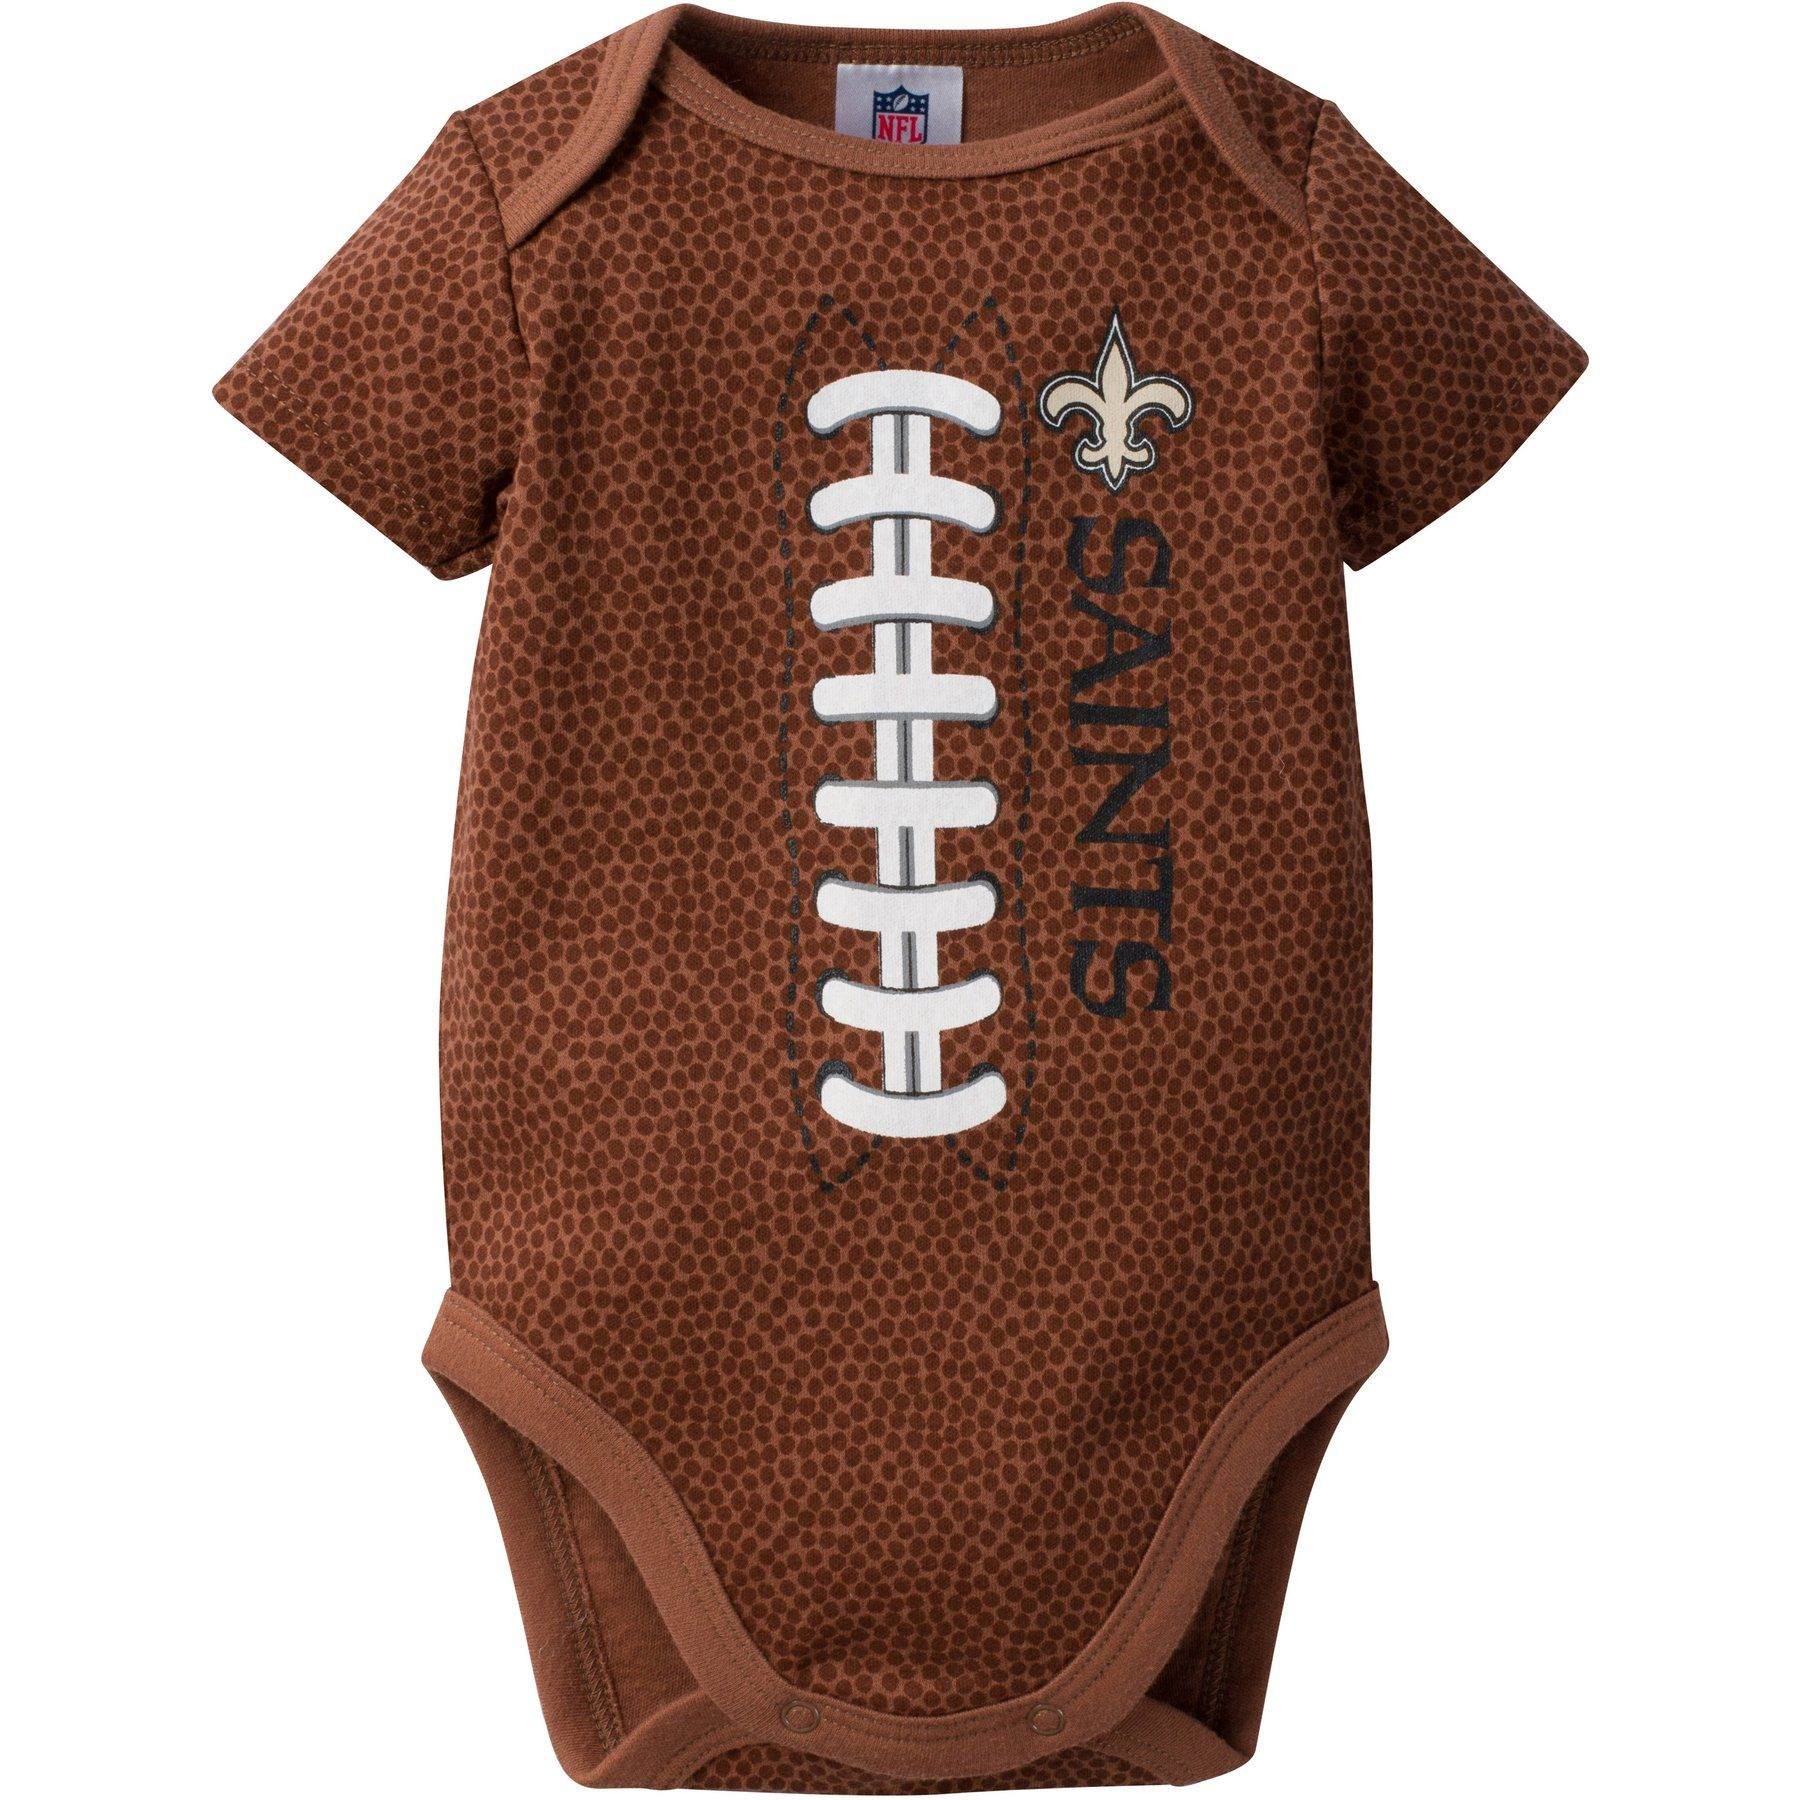 Indianapolis baby bodysuit football bodysuit Cutest Colts fan baby bodysuit